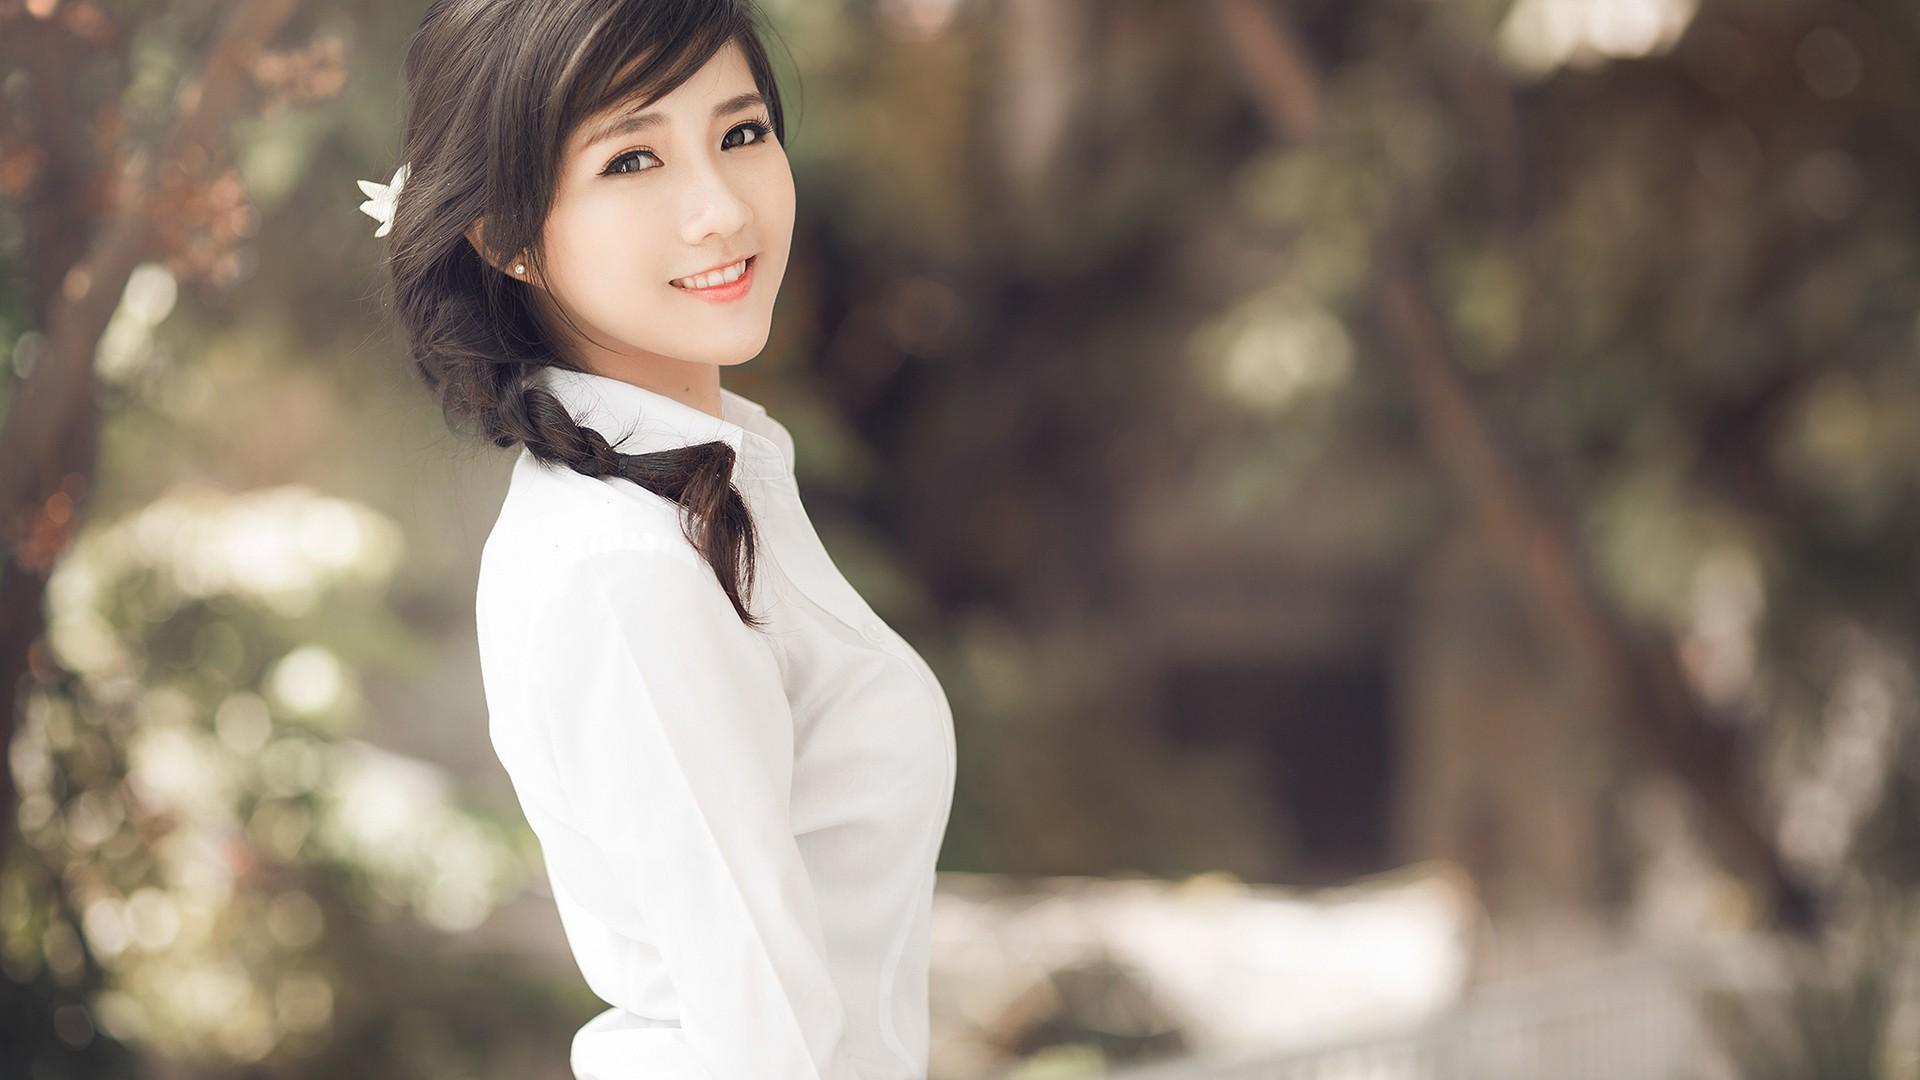 Asian Cute Girl Hd Desktop Wallpaper - Cutest Girl Wallpaper Hd , HD Wallpaper & Backgrounds